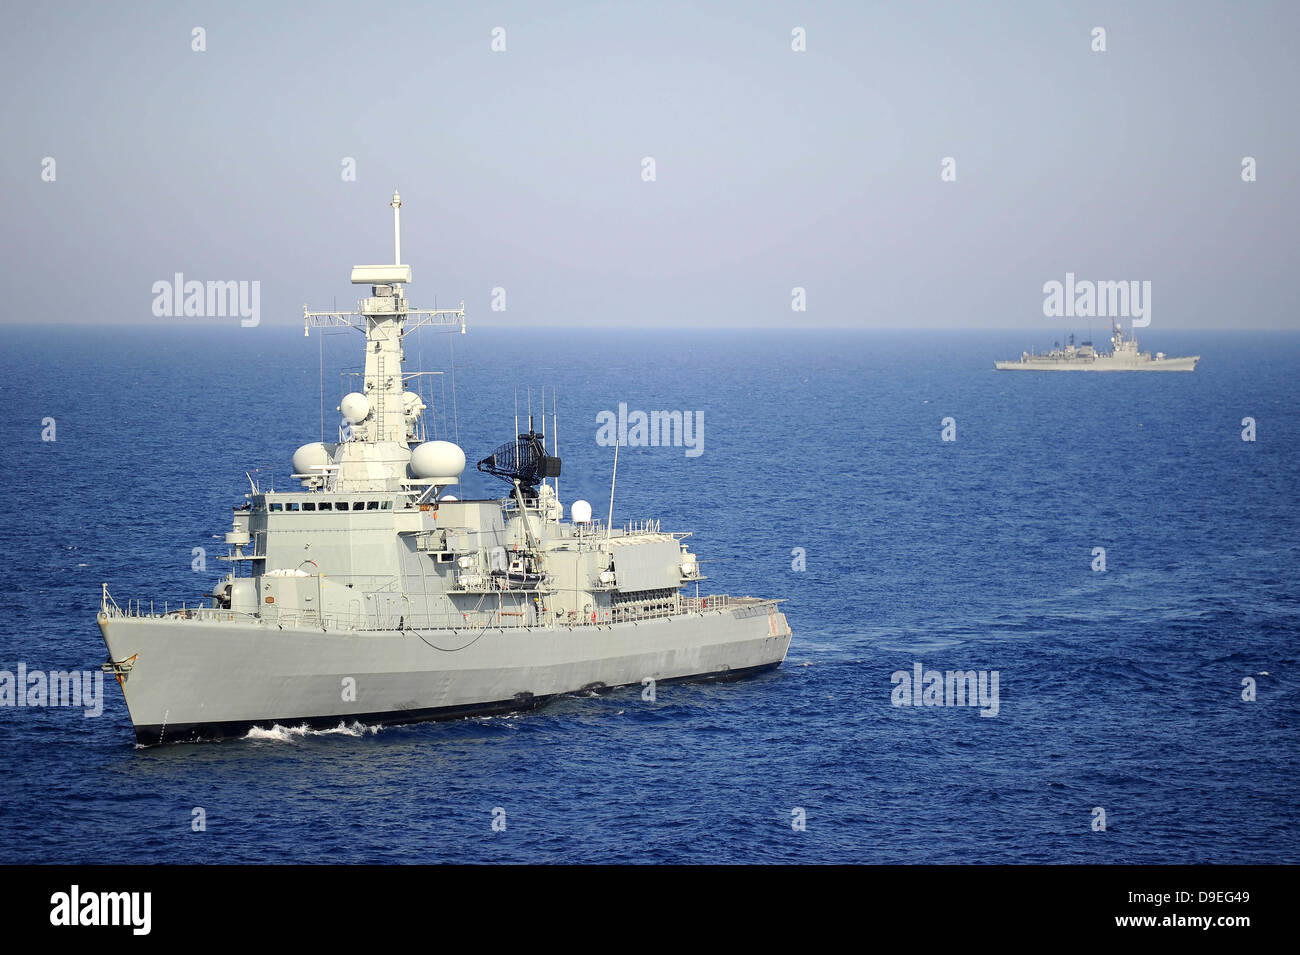 Portuguese navy frigate NRP Bartolomeu Dias in transit in the Mediterranean Sea. - Stock Image